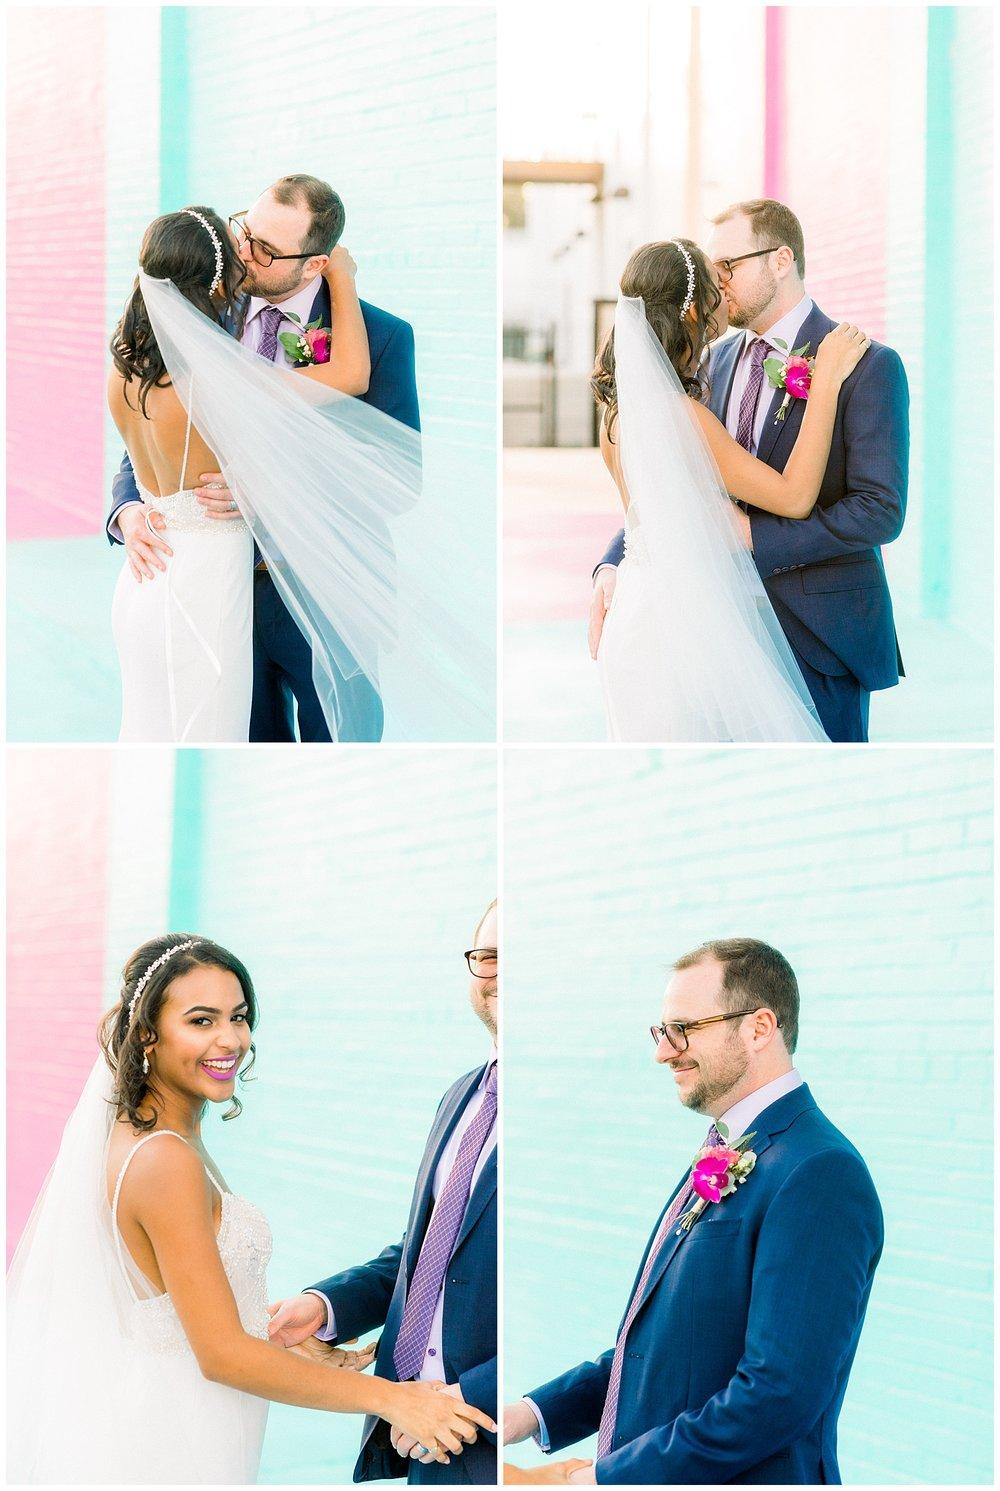 jessicafredericks_lakeland_tampa_wedding_purple_crazy hour_0065.jpg